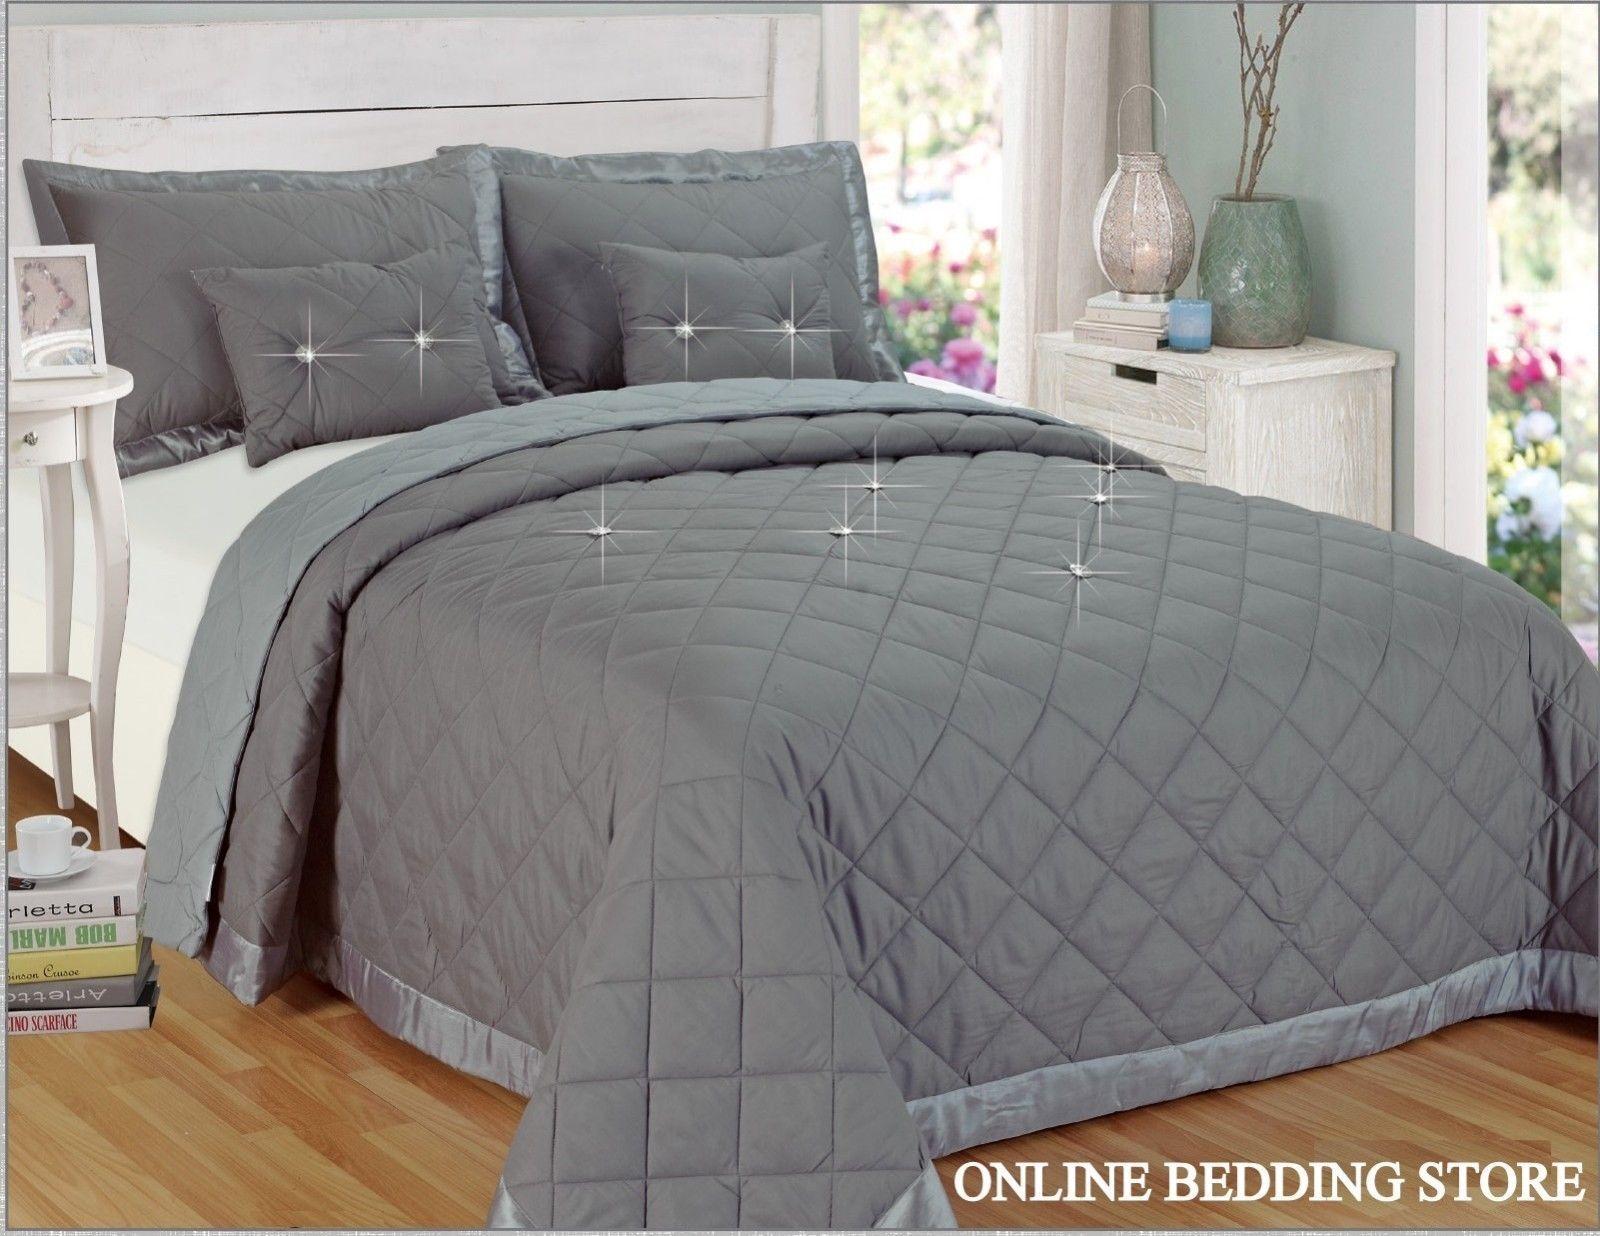 Luxury 5 Piece Beautiful Bedspread  Diamond Reversible Comforter set   grau